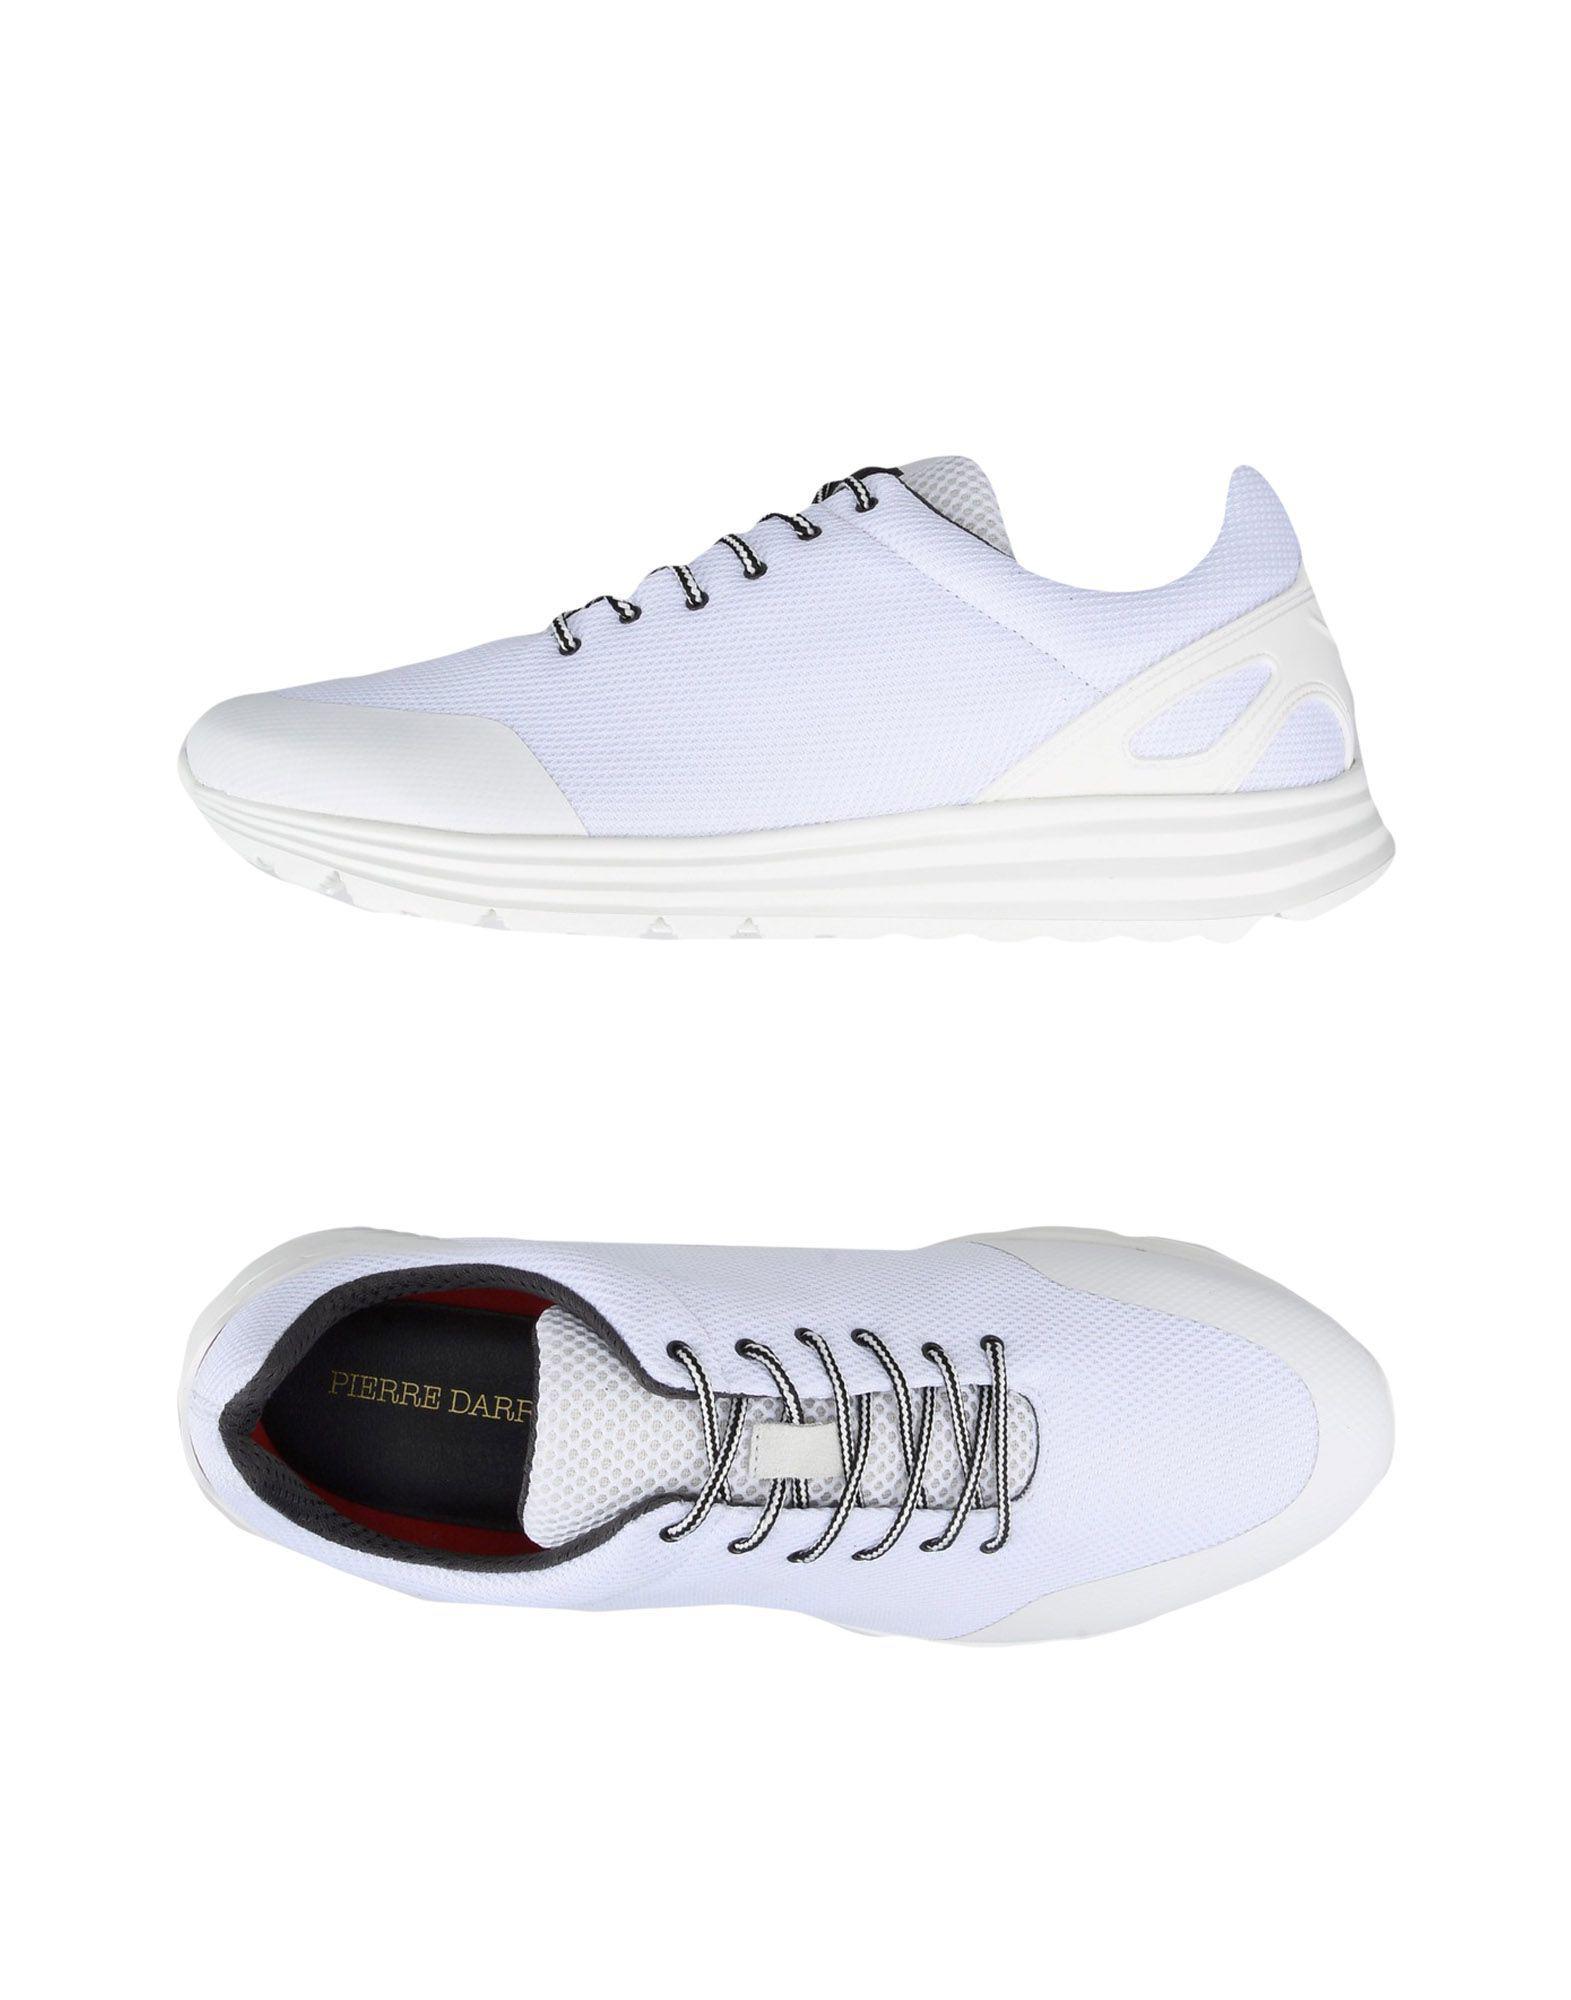 FOOTWEAR - Low-tops & sneakers Pierre Darre hLneP5GATc